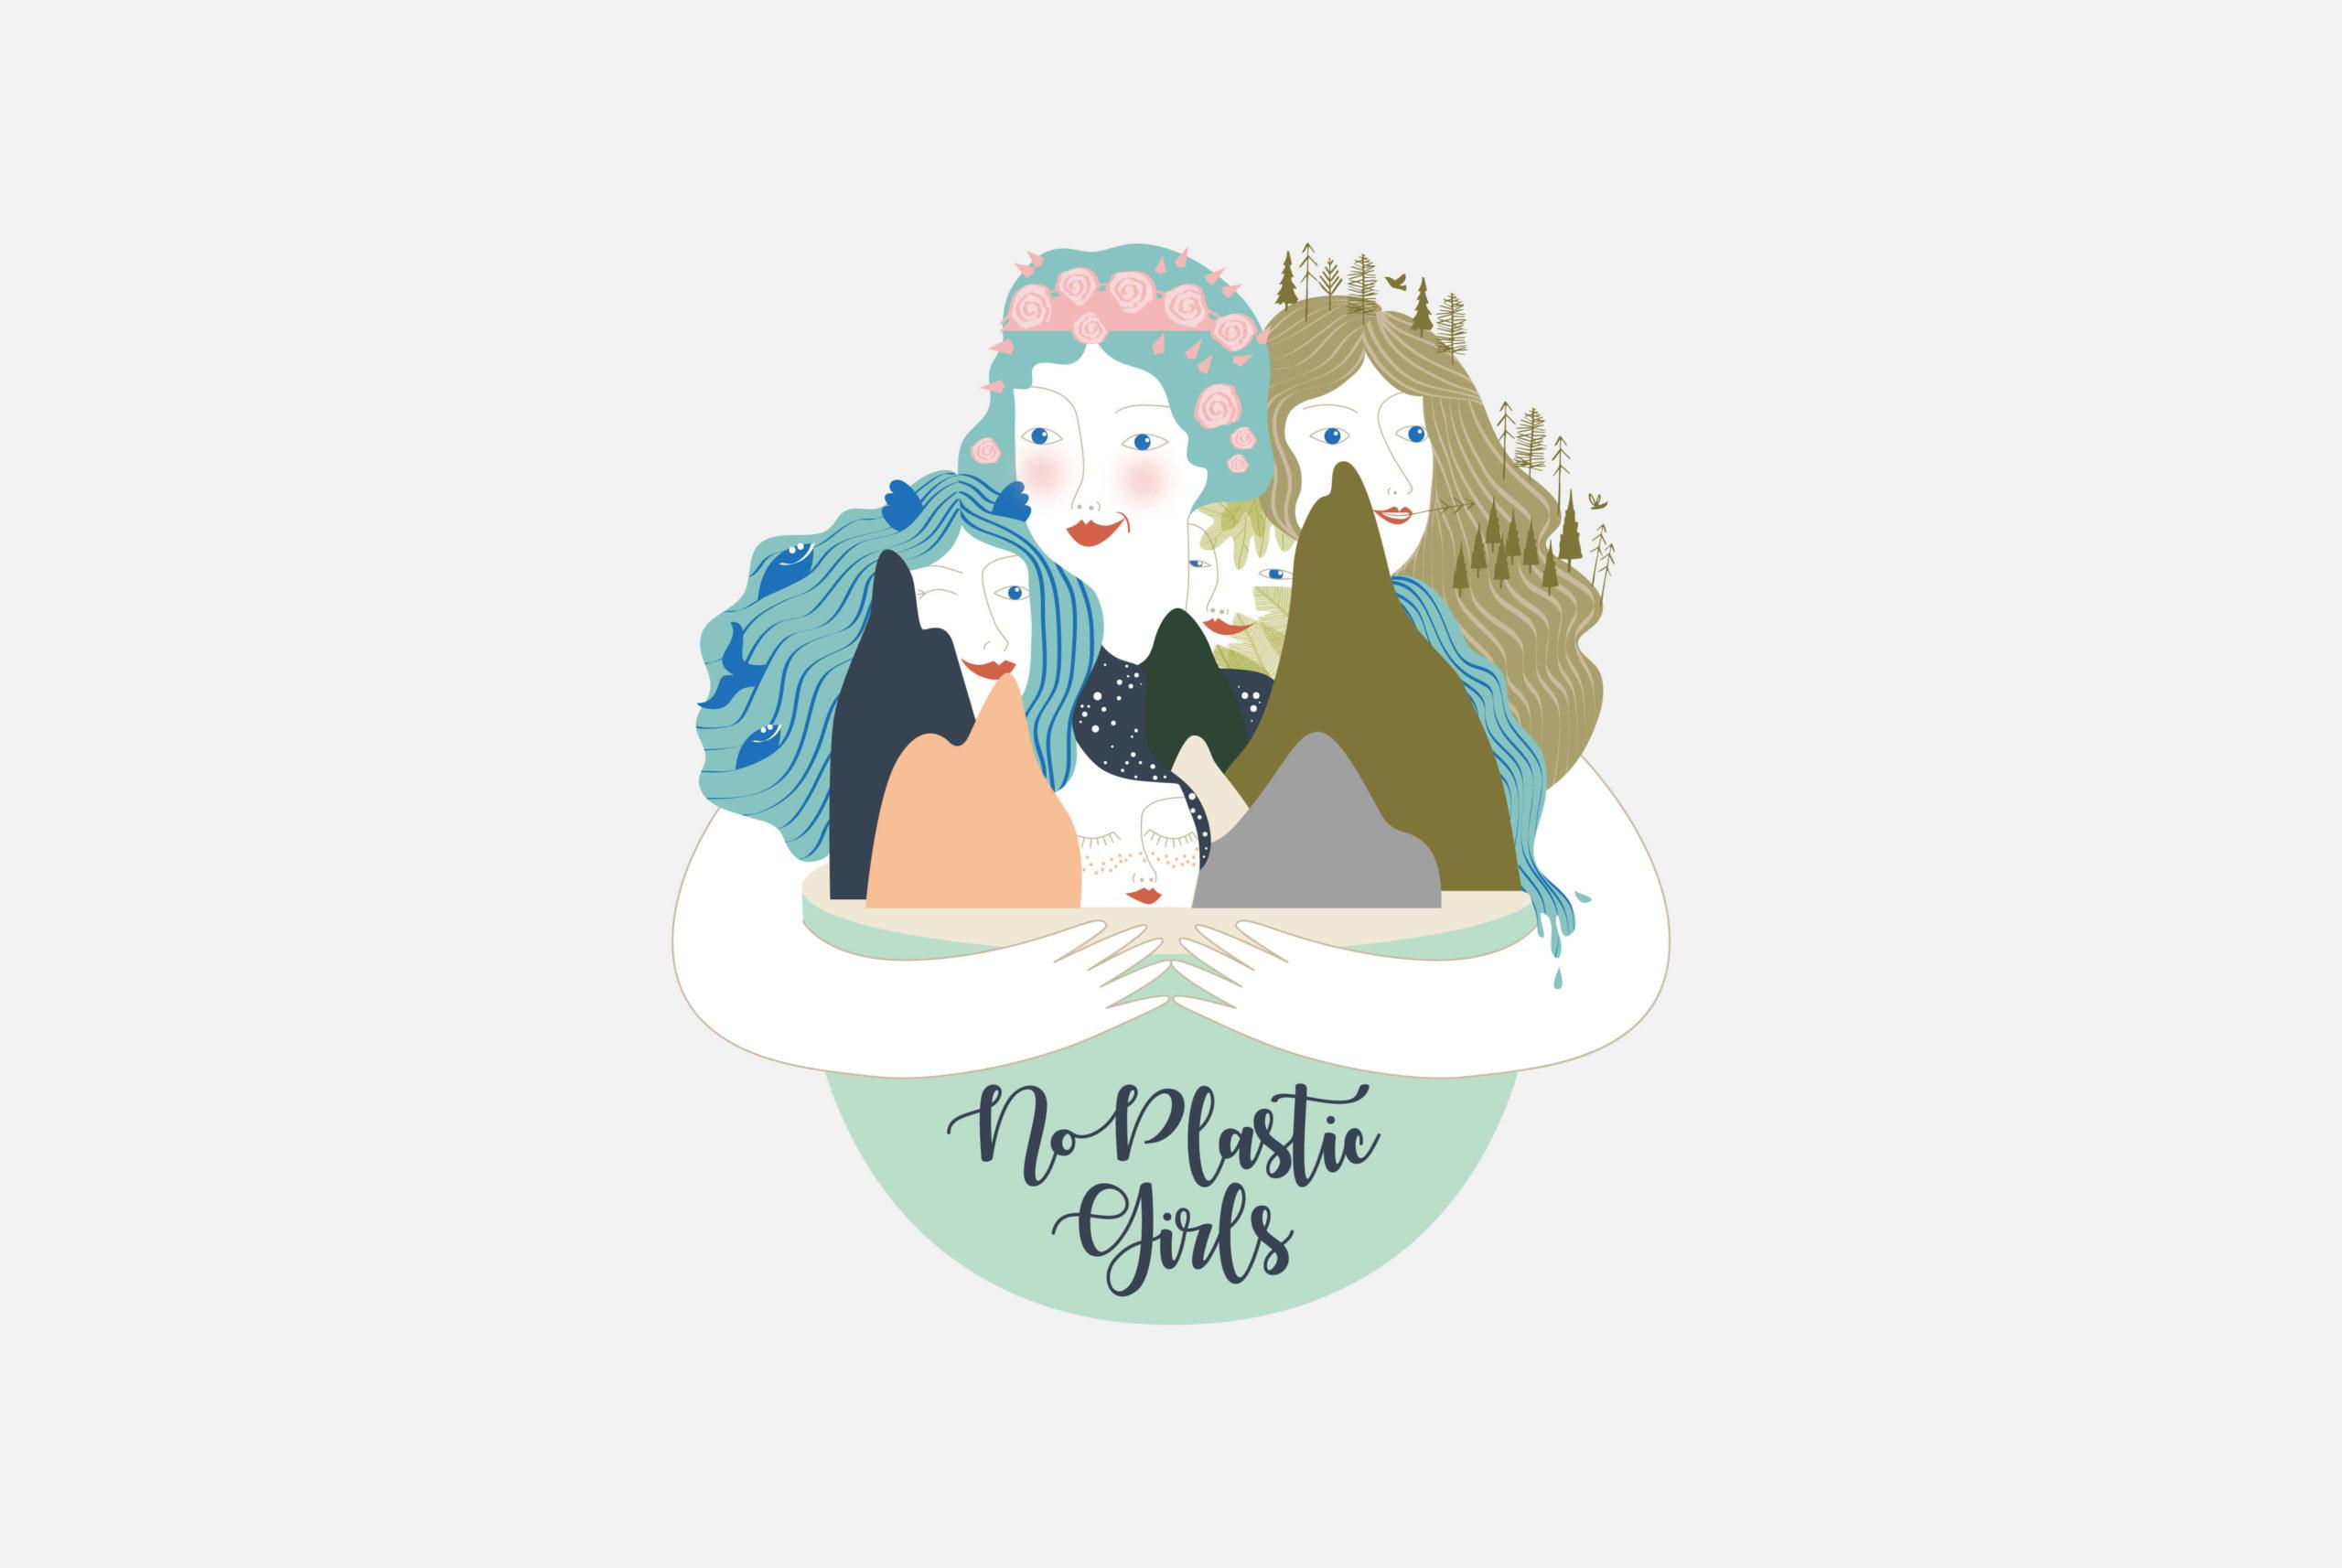 No Plastic Girls